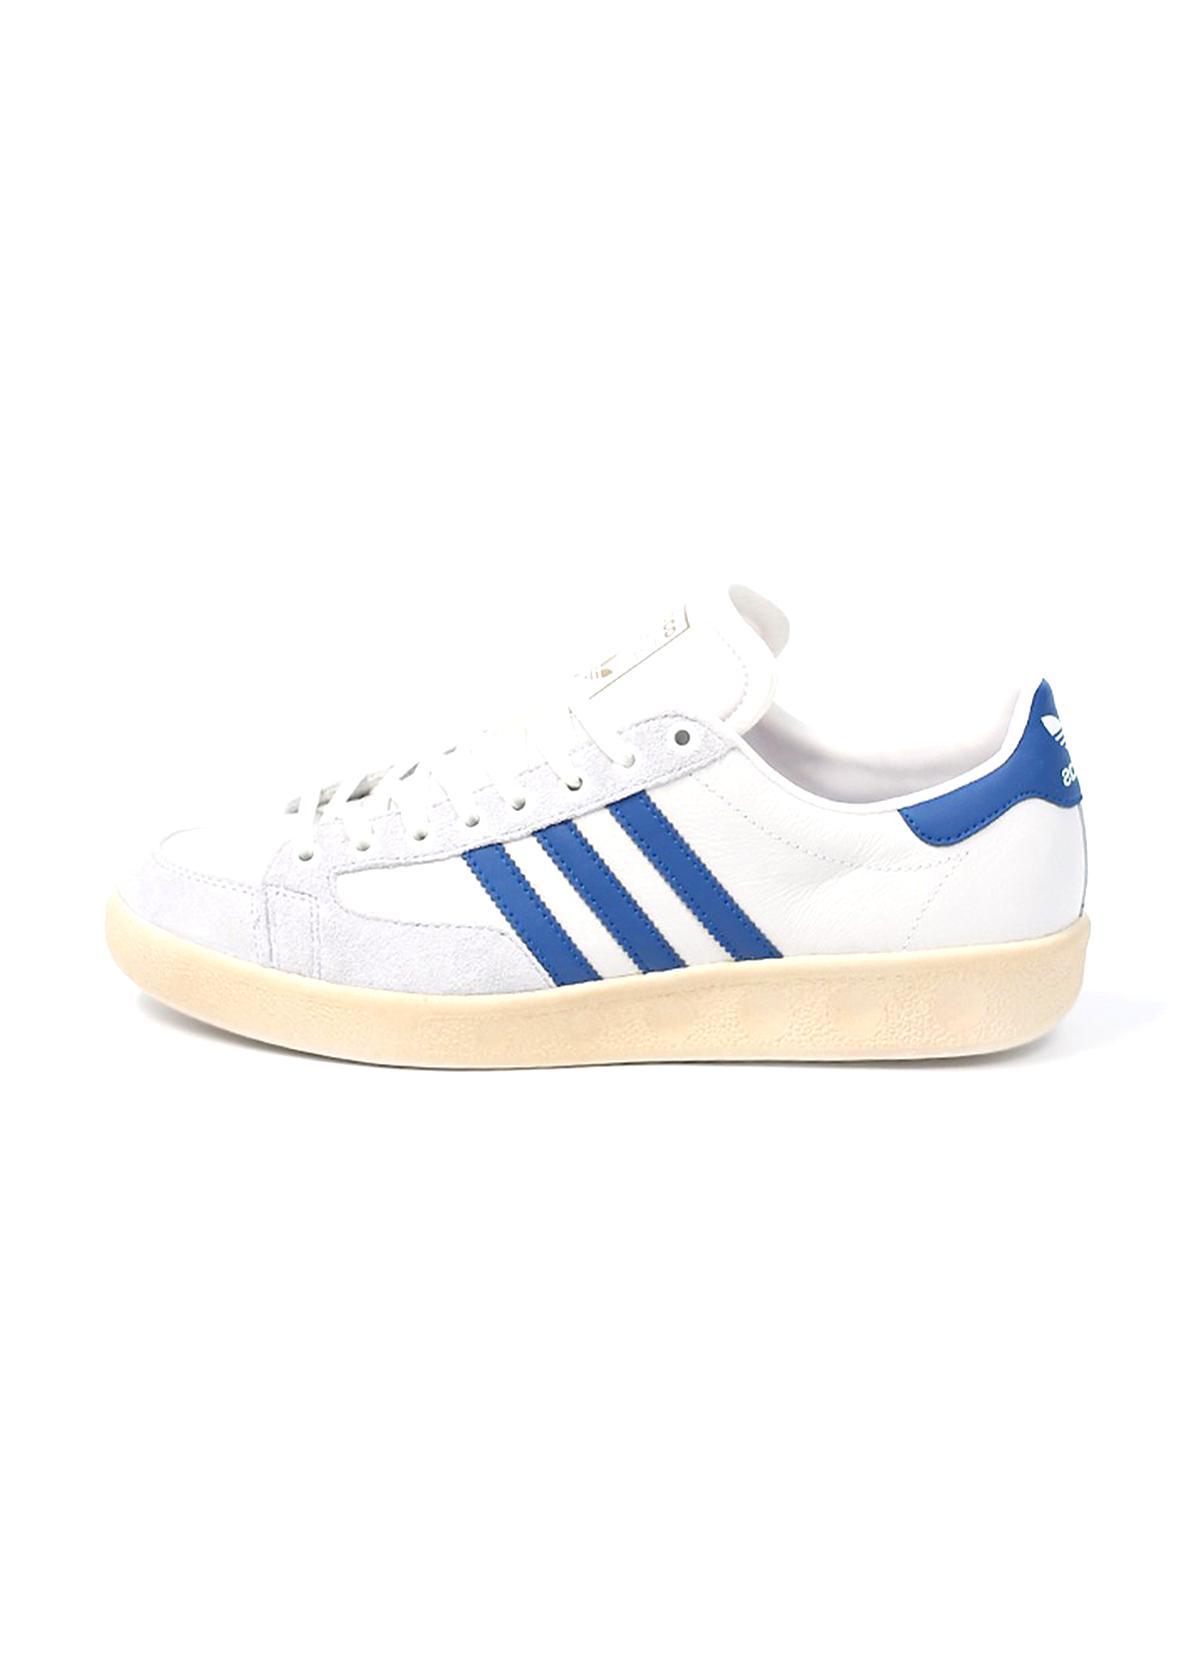 Adidas Nastase Vintage d'occasion